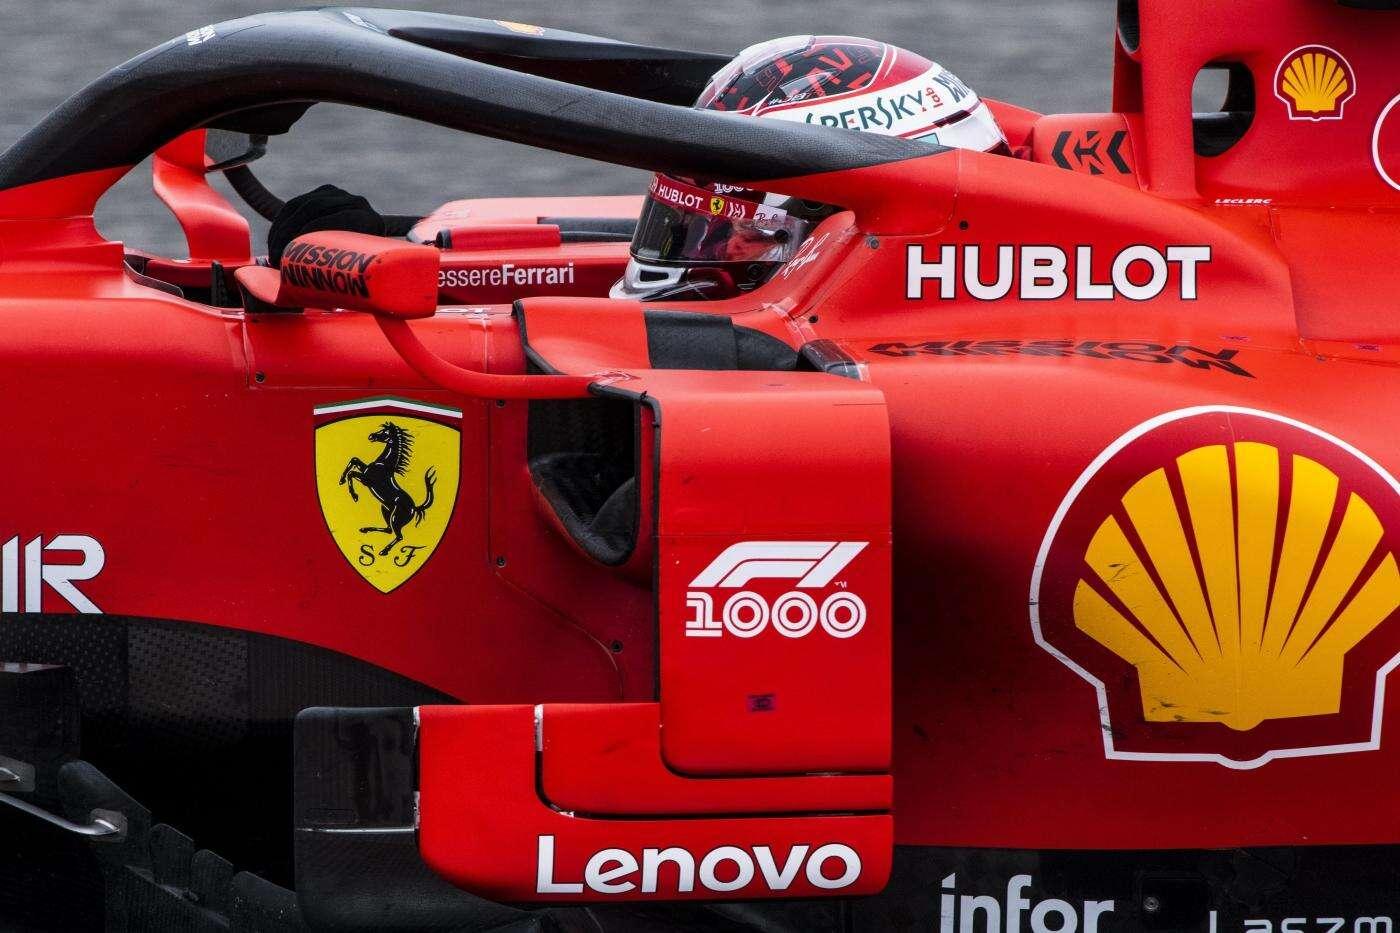 Ferrari Breaks Long Term Partnership With Hublot For Richard Mille Racetrackmasters Com